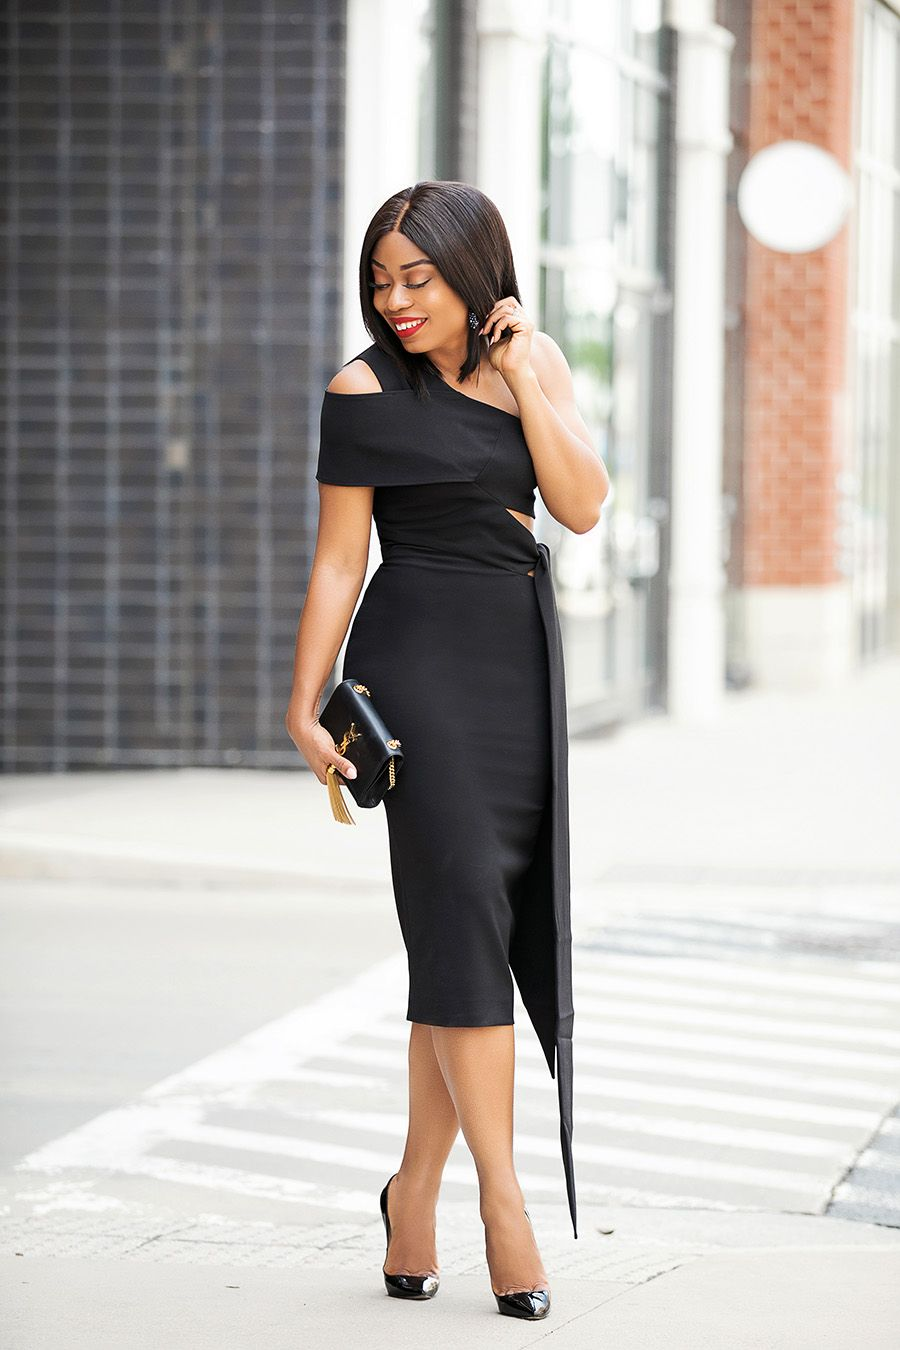 Summer Wedding Black Dress Www Jadore Fashion Com Summer Wedding Outfits Fashion Fashion For Petite Women